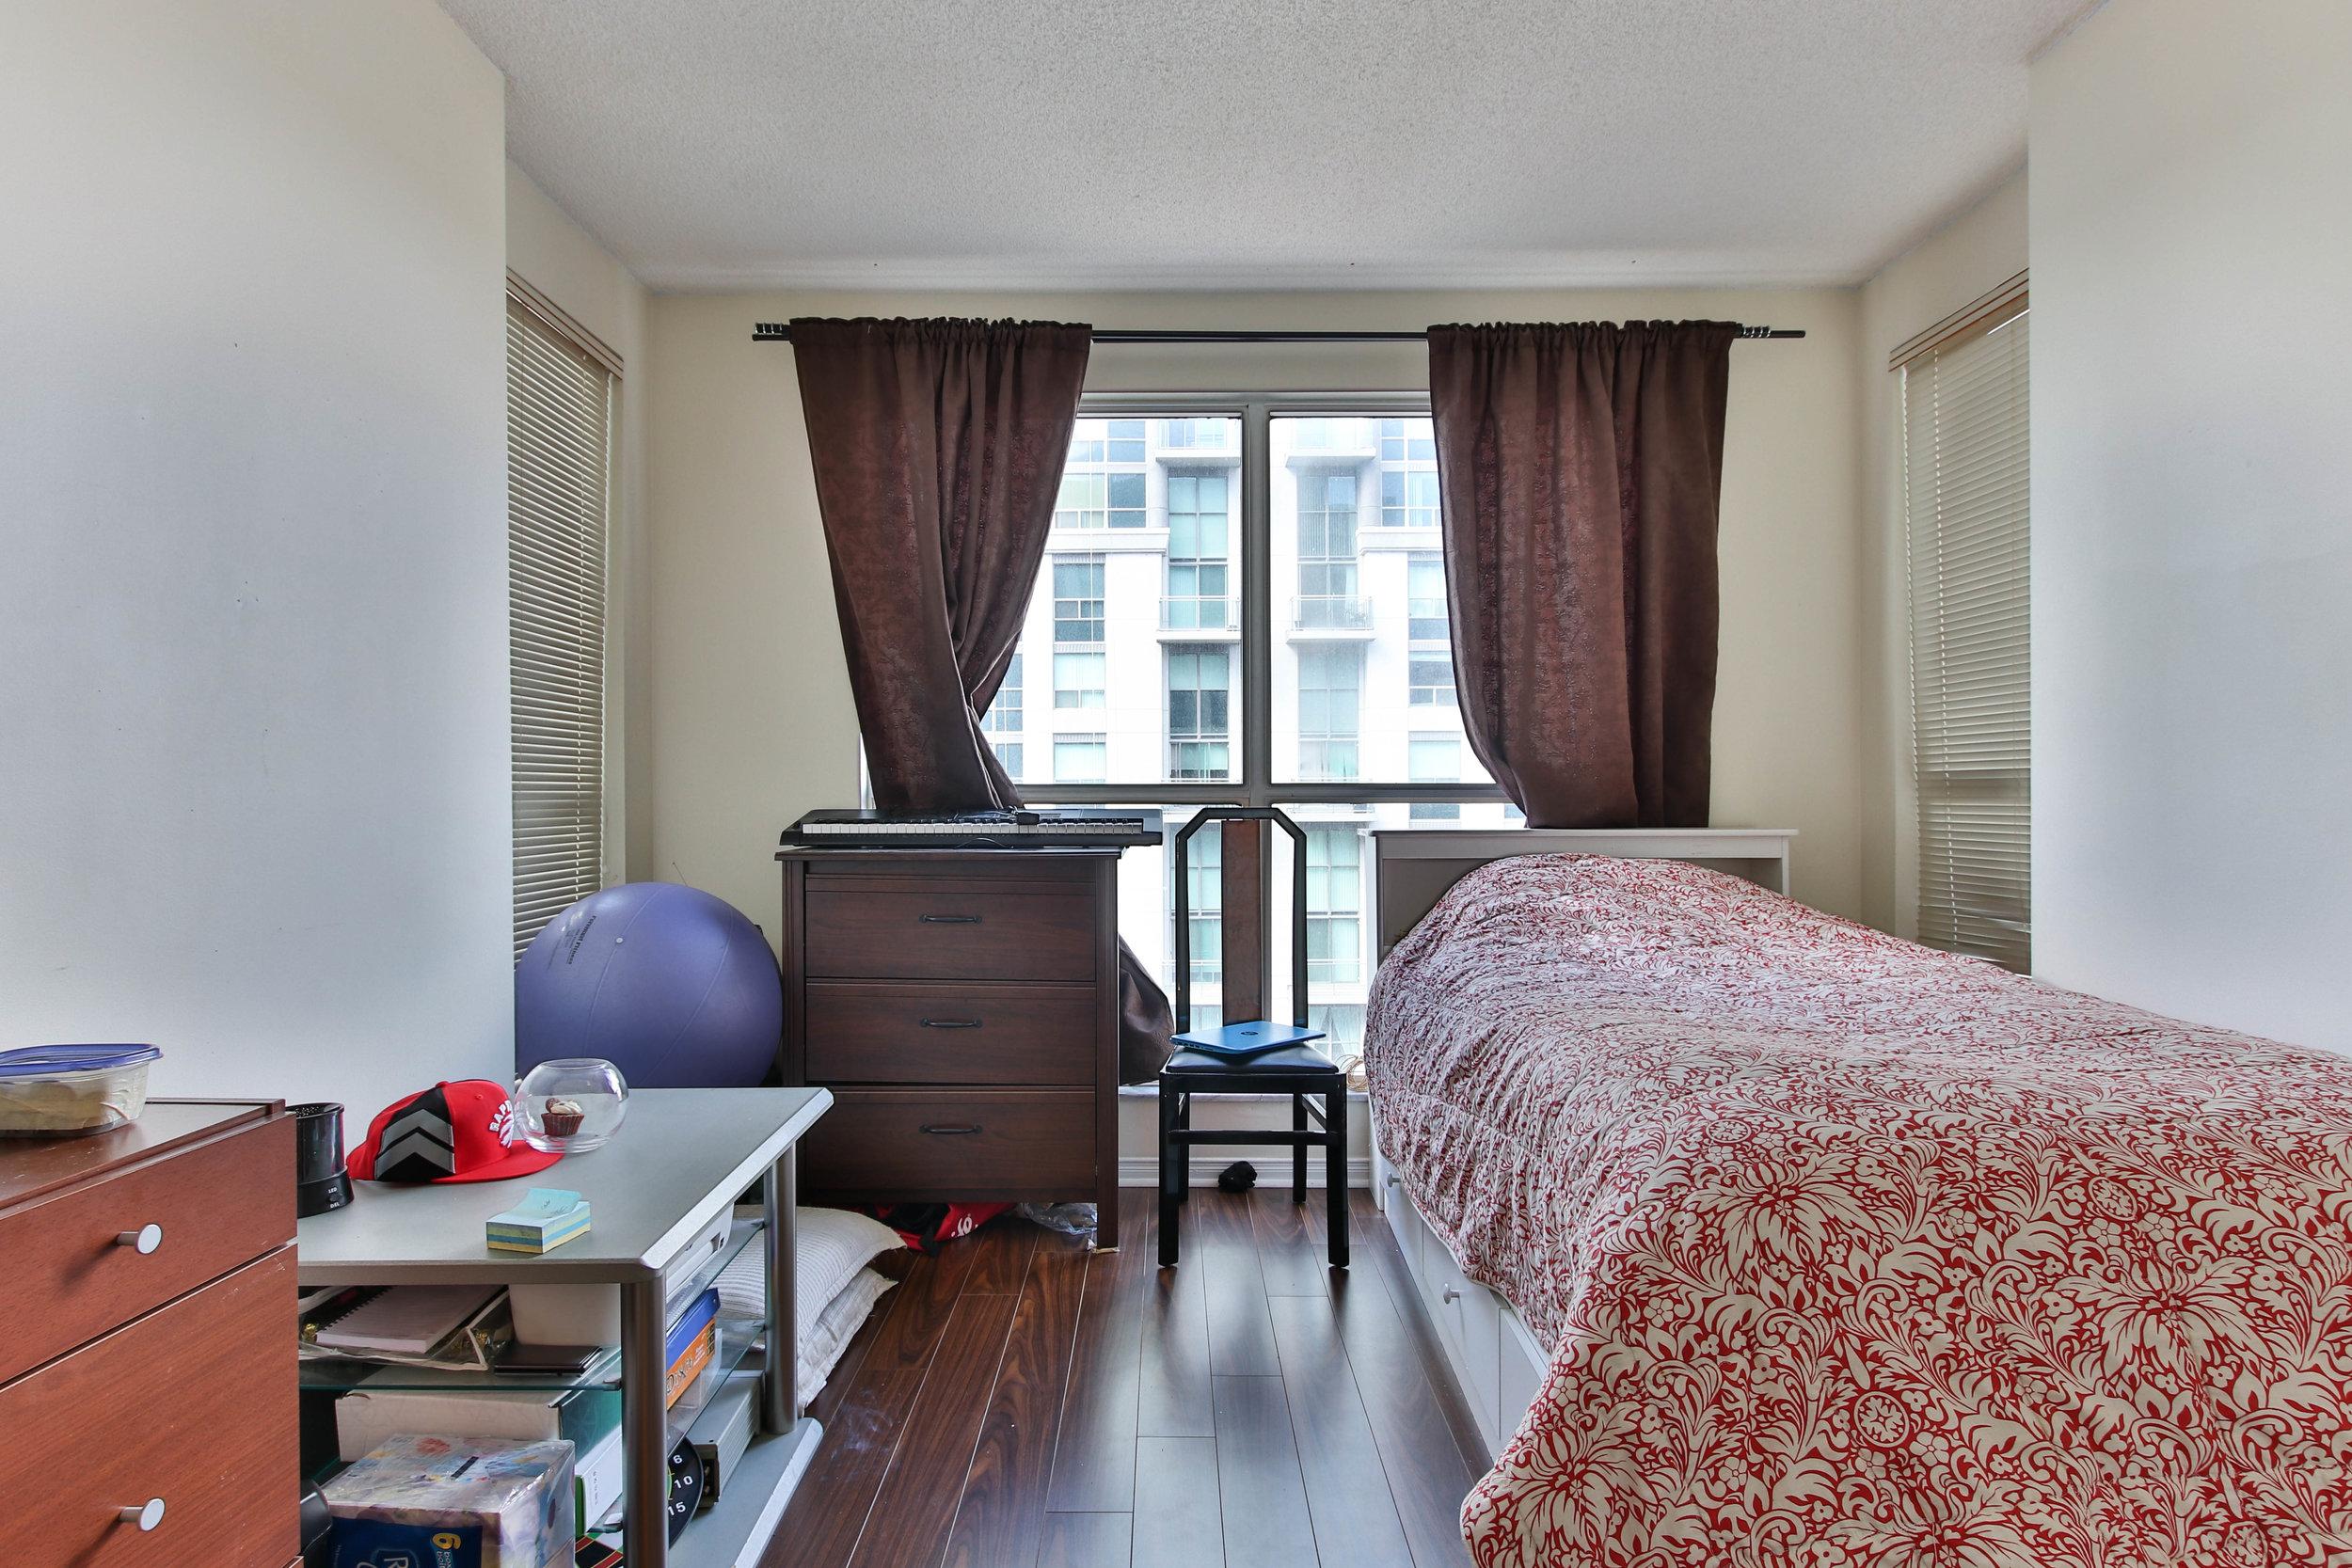 18_Bedroom-3290.jpg